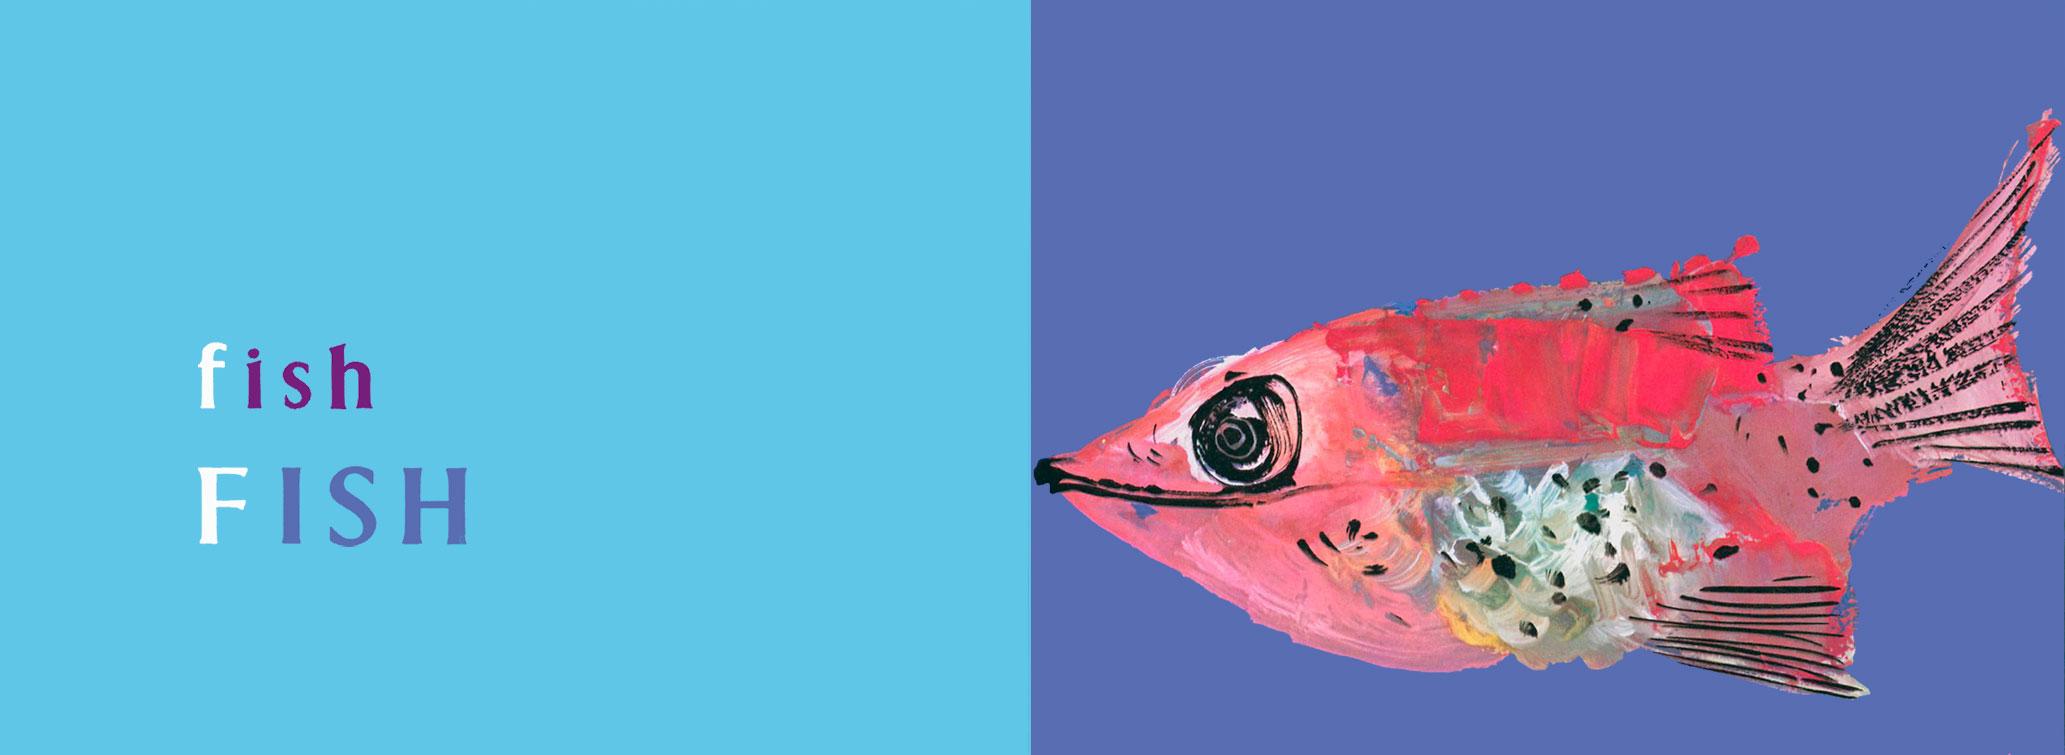 f-for-fish-brian-wildsmith-ABC.jpg